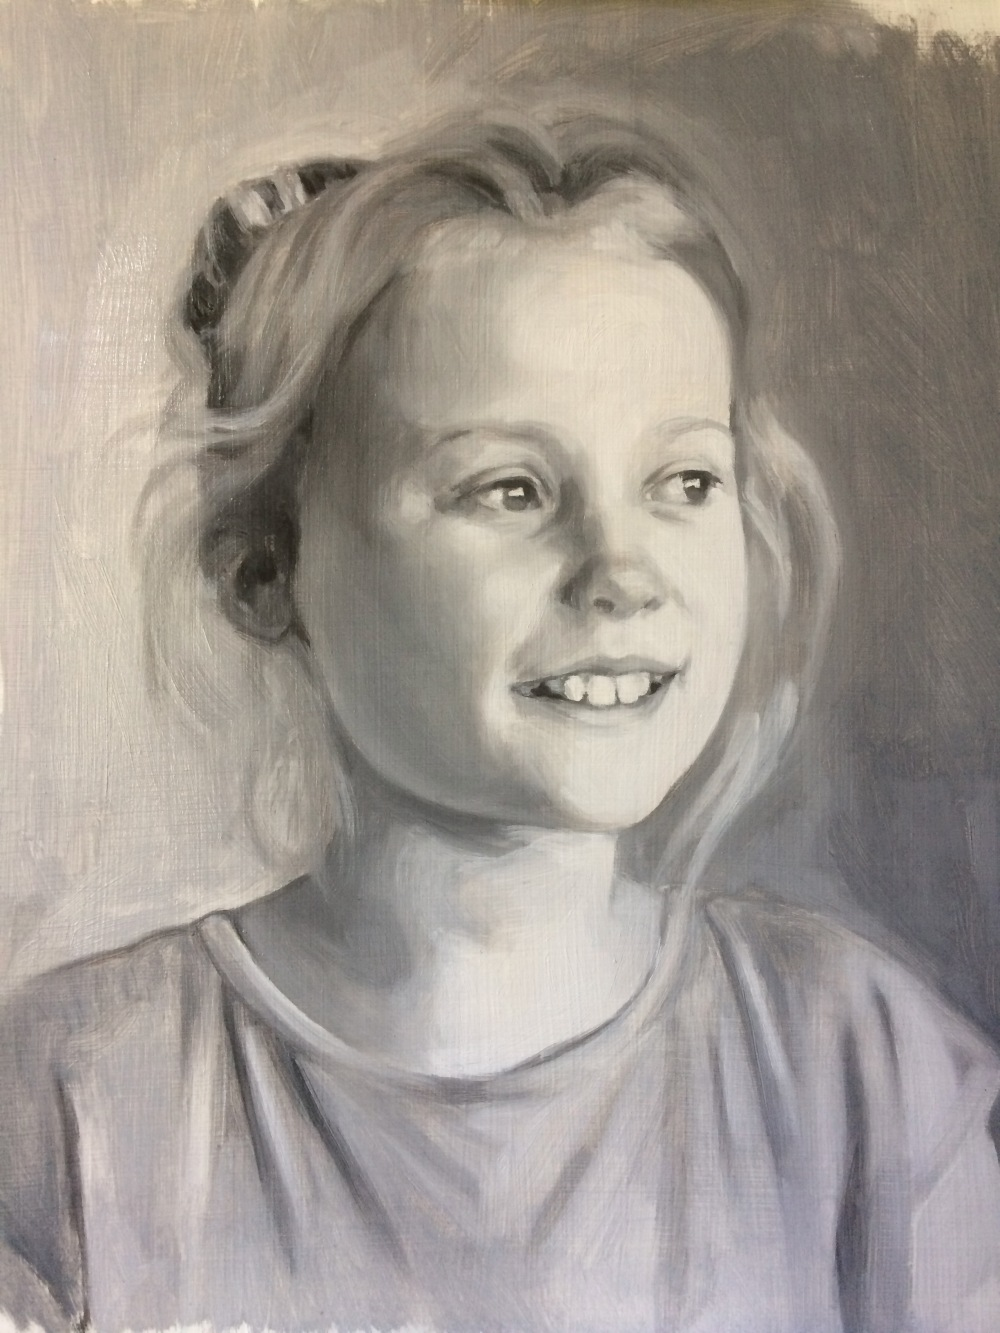 Custom portrait commission of a girl laughing, child portrait in oil paint by portrait painter and artist Matt Harvey